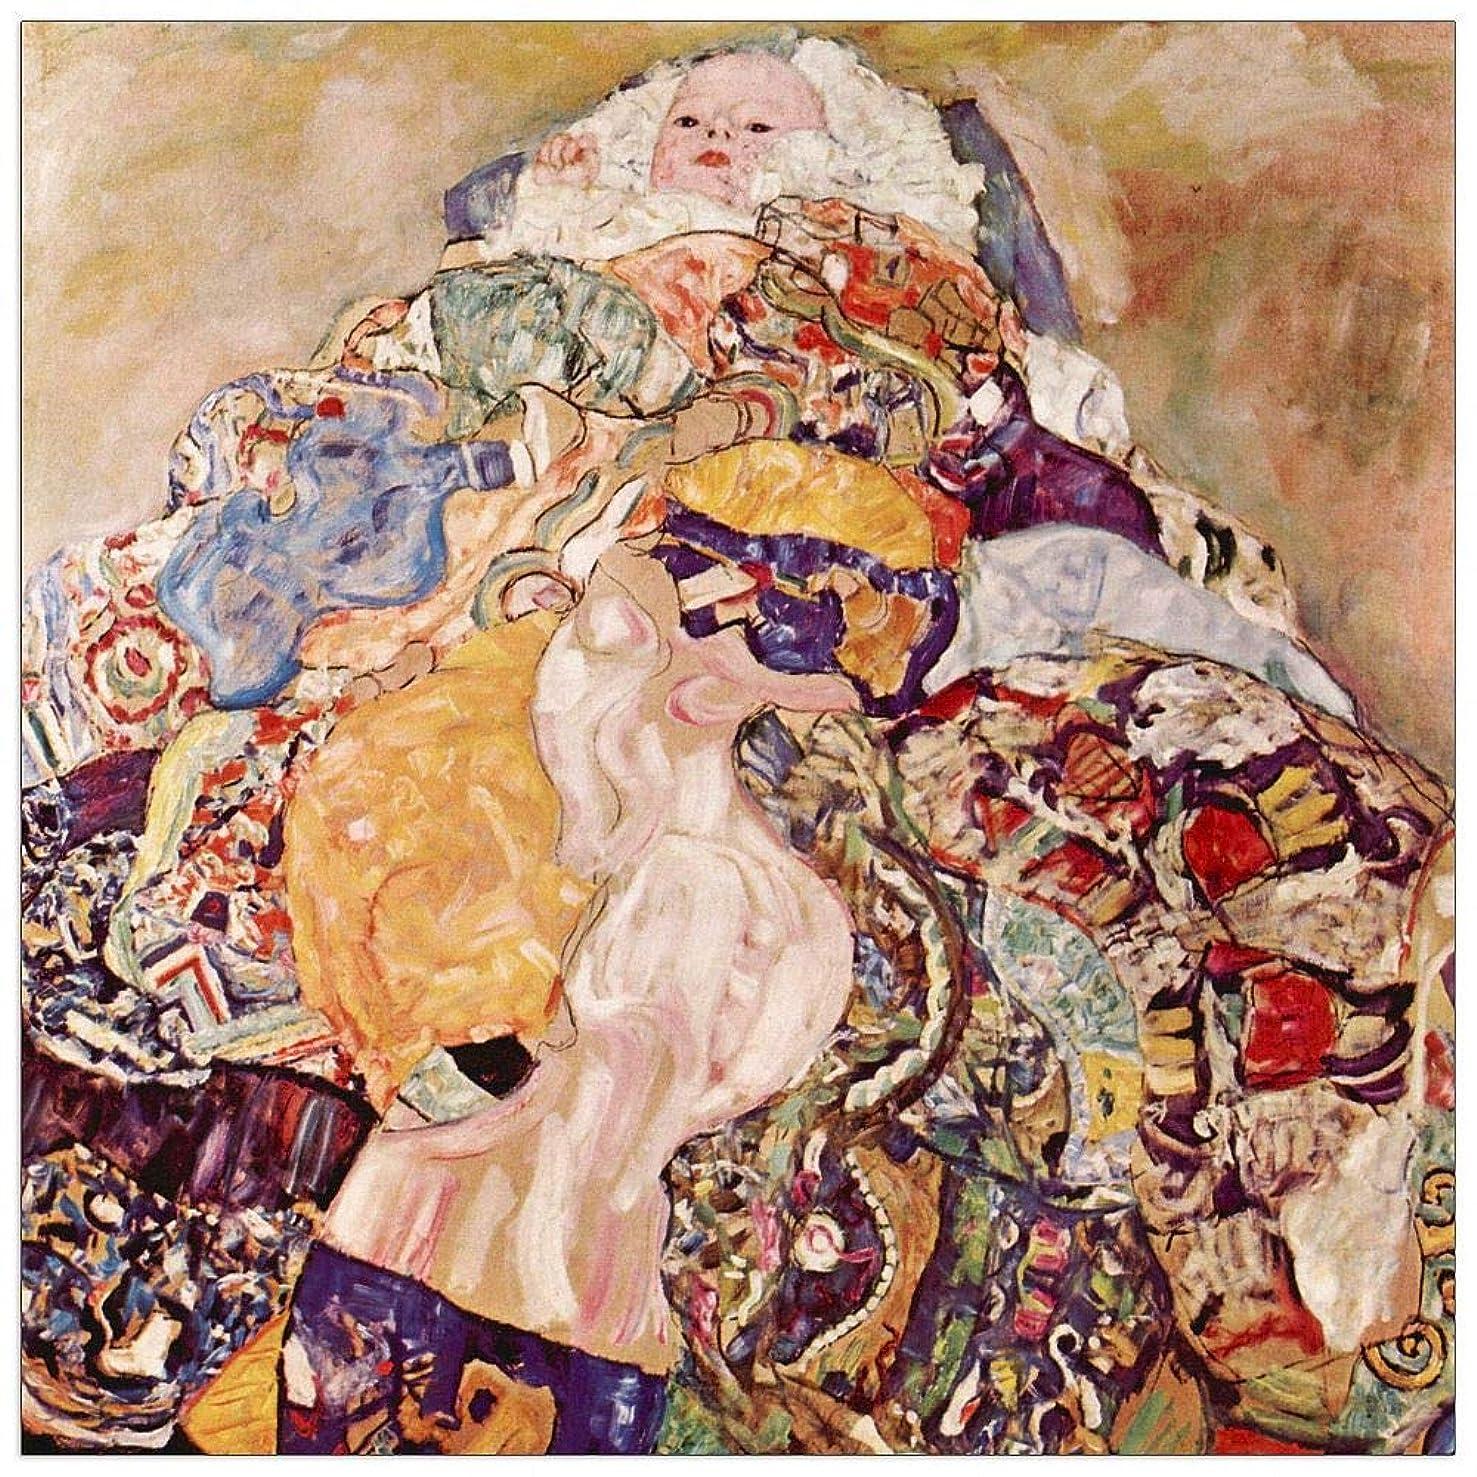 ArtPlaza TW90232 Klimt Gustav - Baby Decorative Panel 15.5x15.5 Inch Multicolored